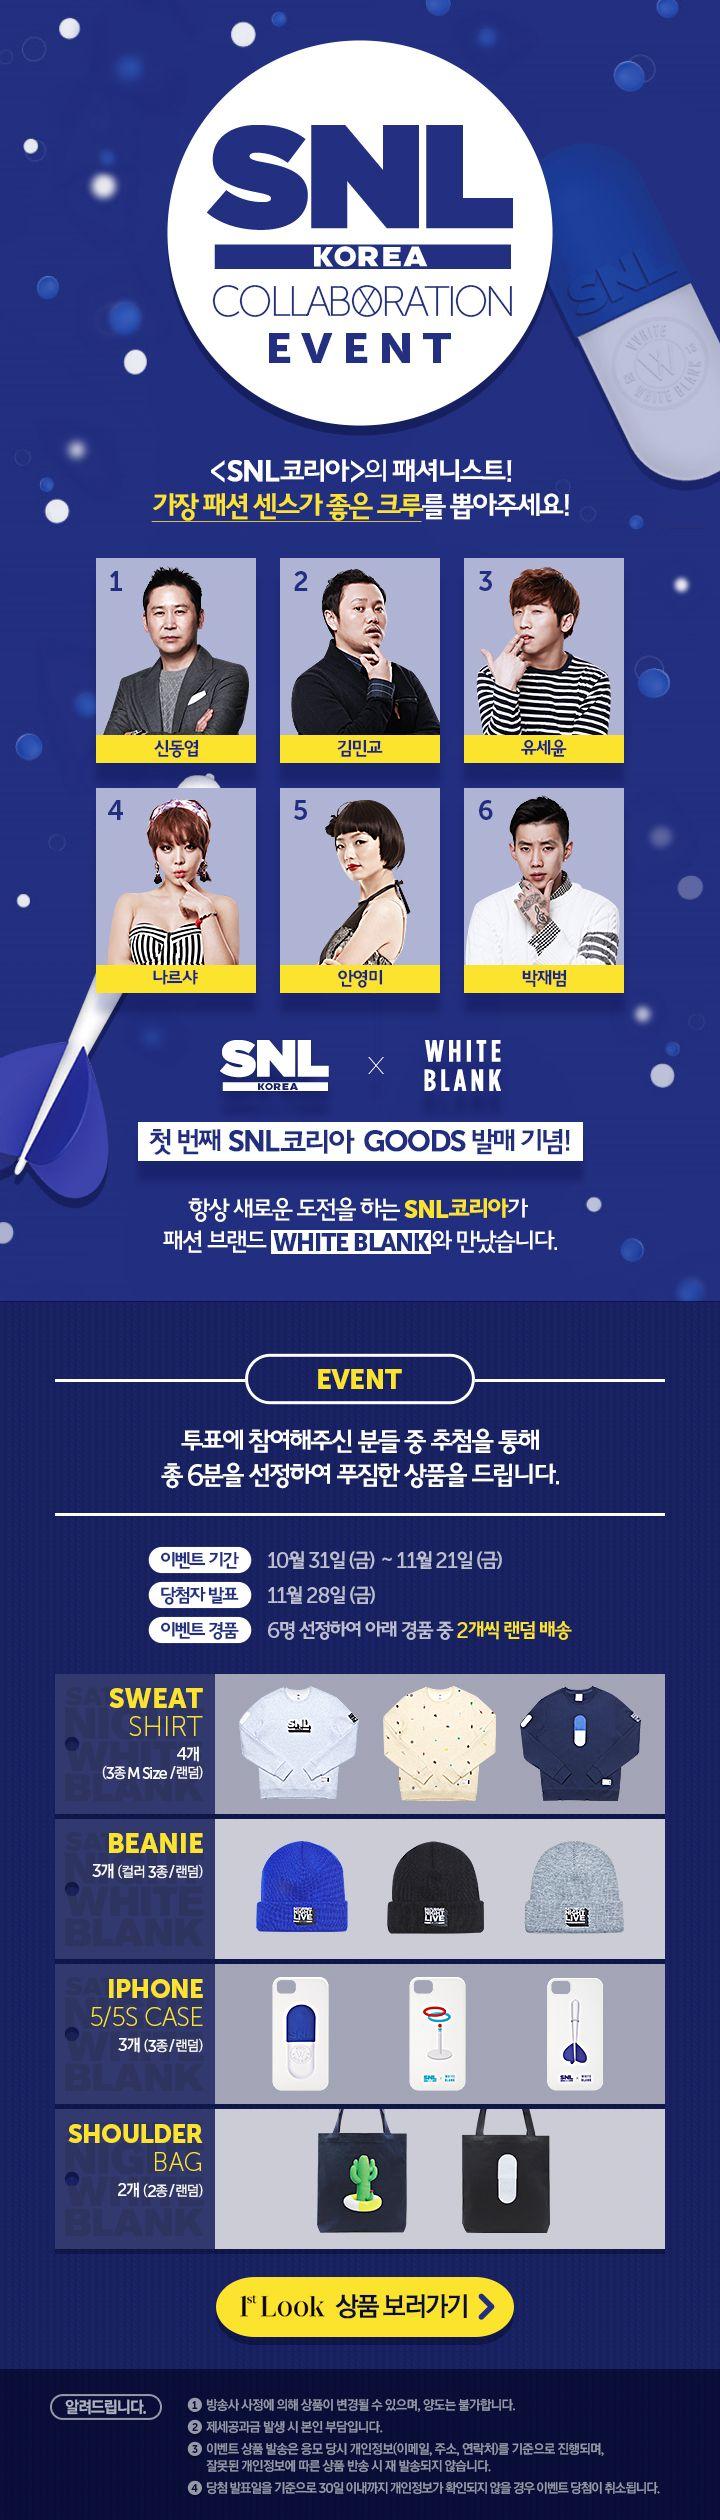 SNL 이벤트 - Google 검색